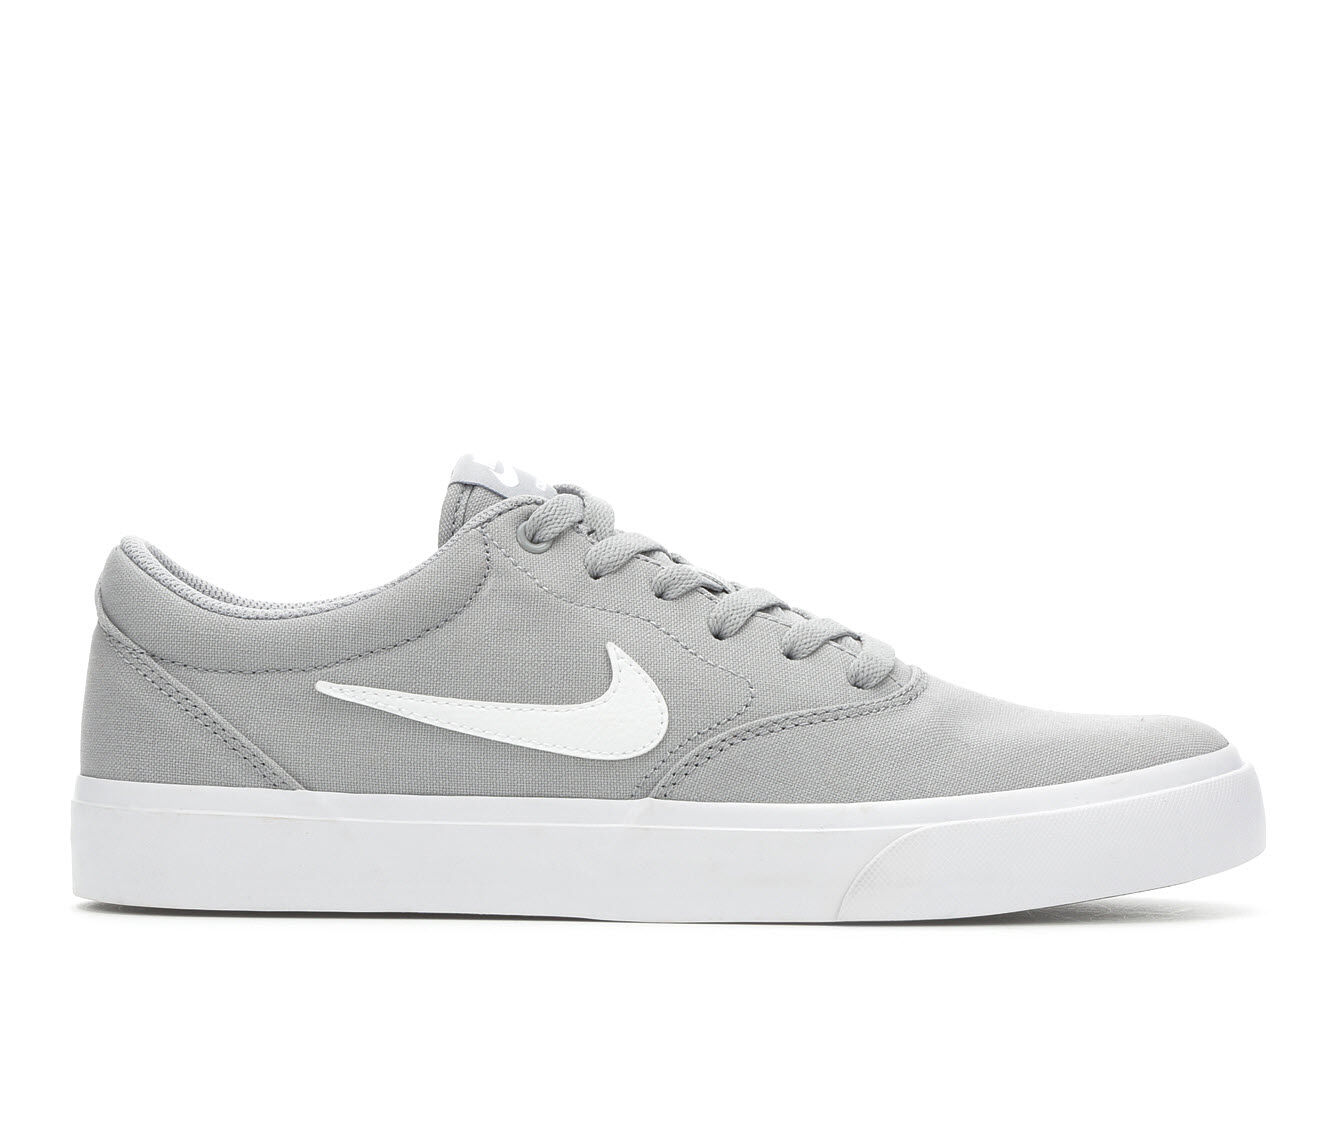 Men's Nike SB Charge Skate Shoes Gry/Wht 003